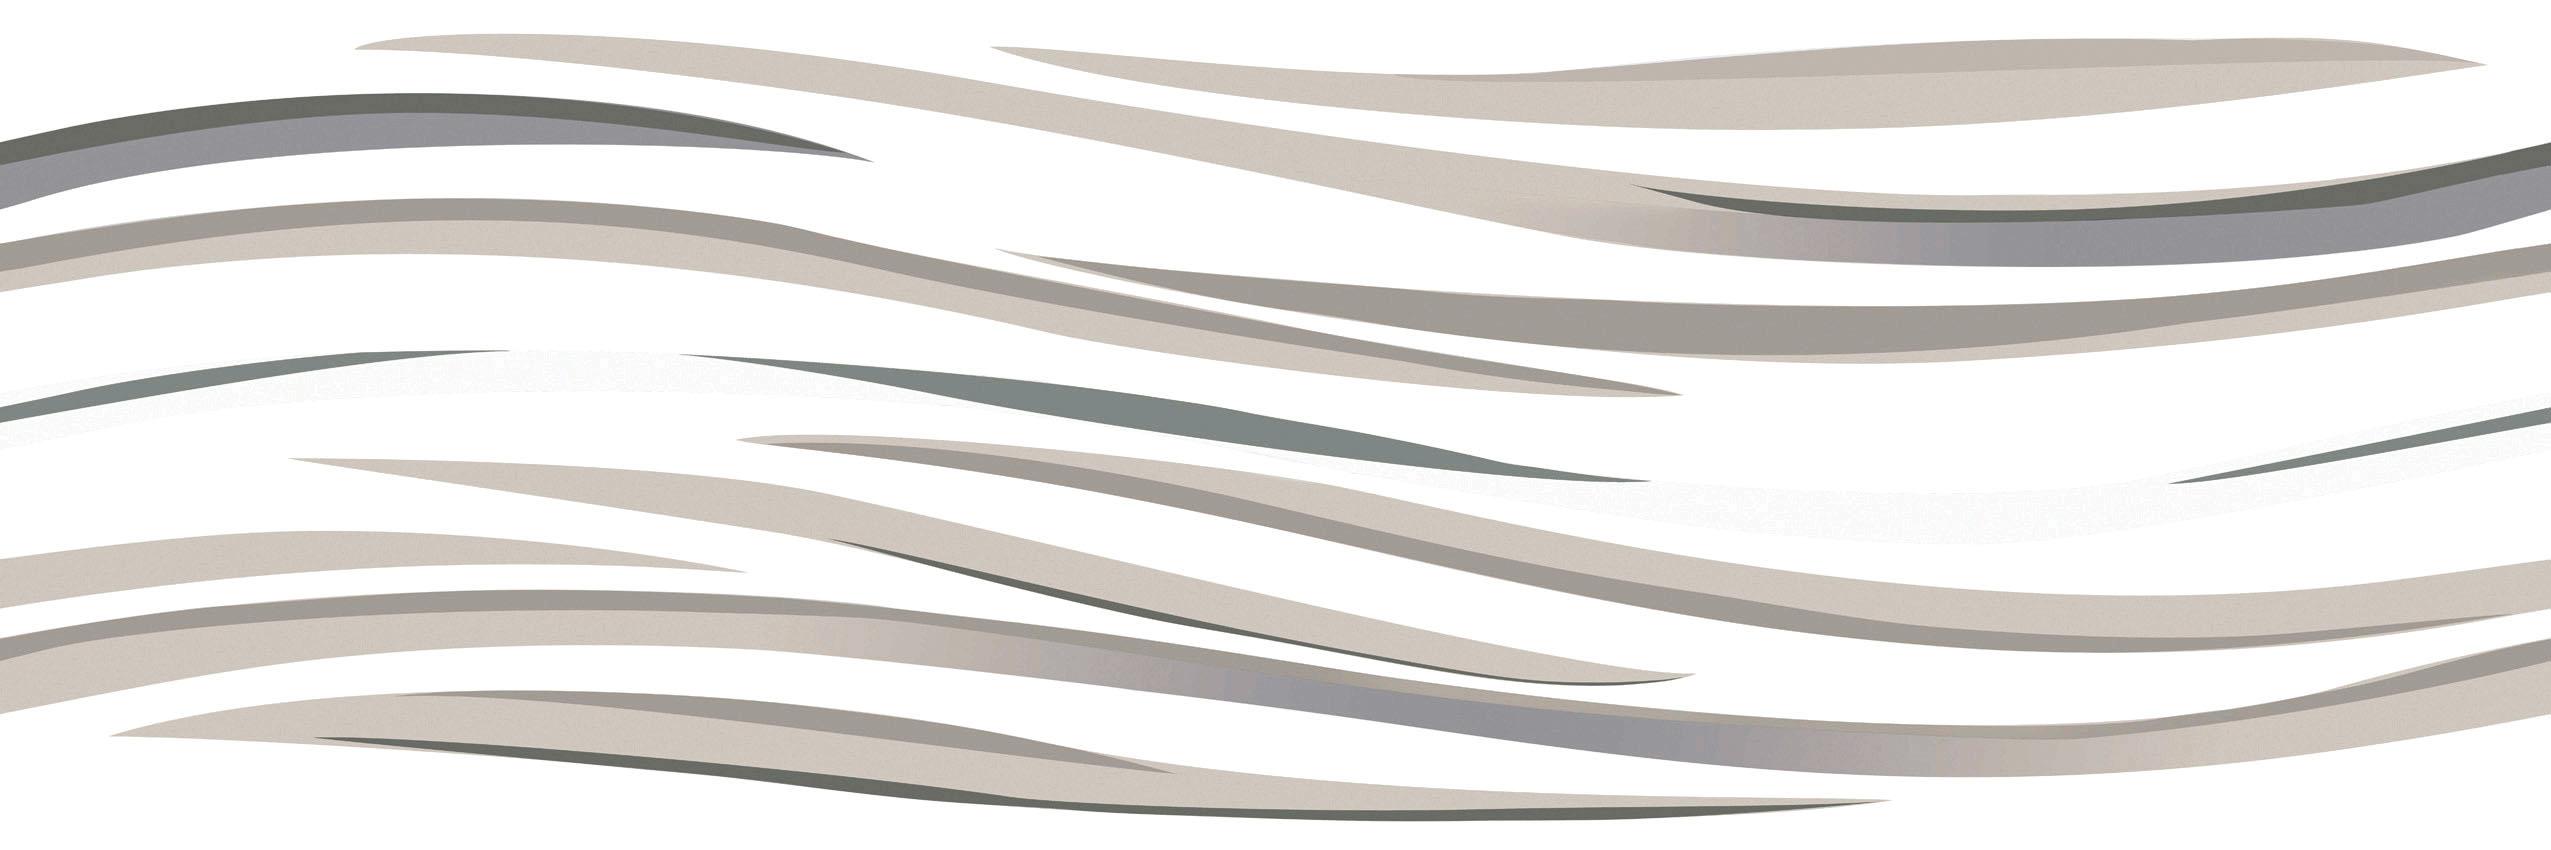 LONGFAVOR white wave 300x600mm Ceramic Wall Tile oem Borders-4